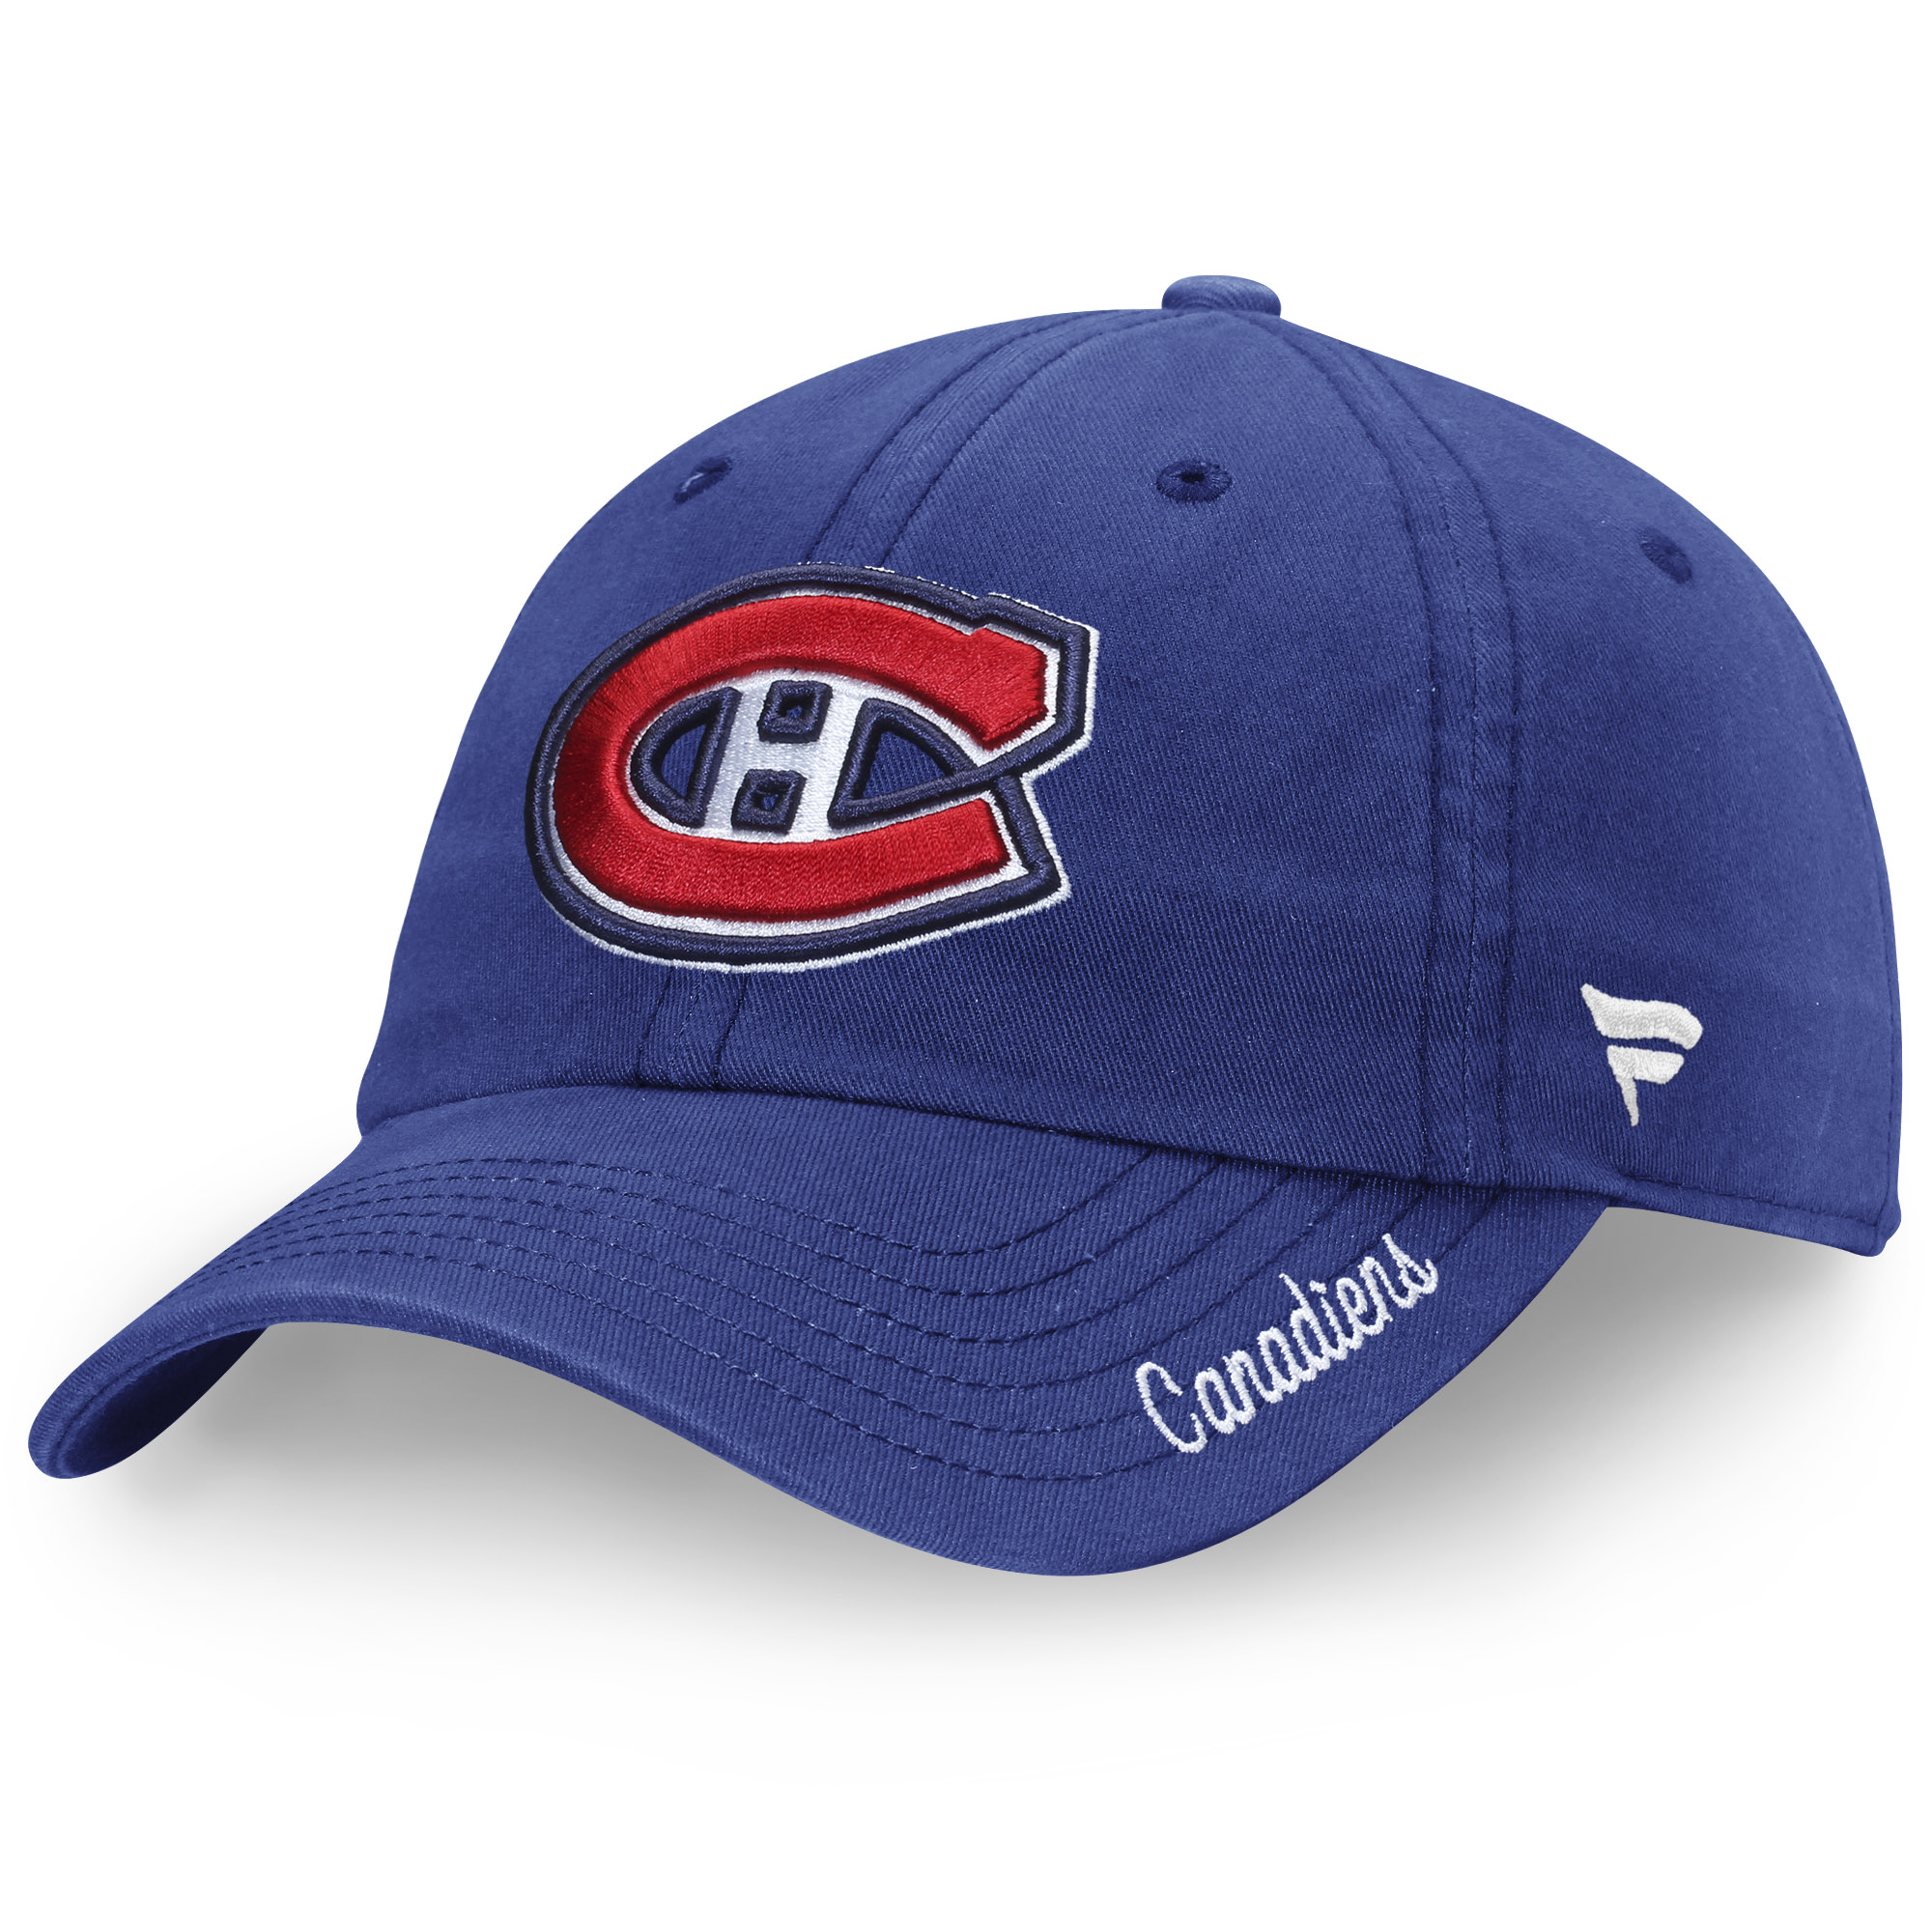 Montreal Canadiens Fanatics Branded Women's Fundamental Adjustable Hat - Royal - OSFA